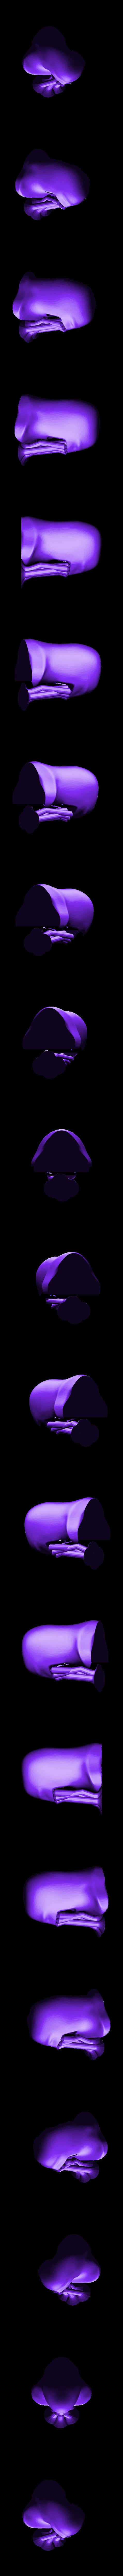 SG_Cowl_Black.stl Download free STL file Space Ghost • 3D printer model, mag-net